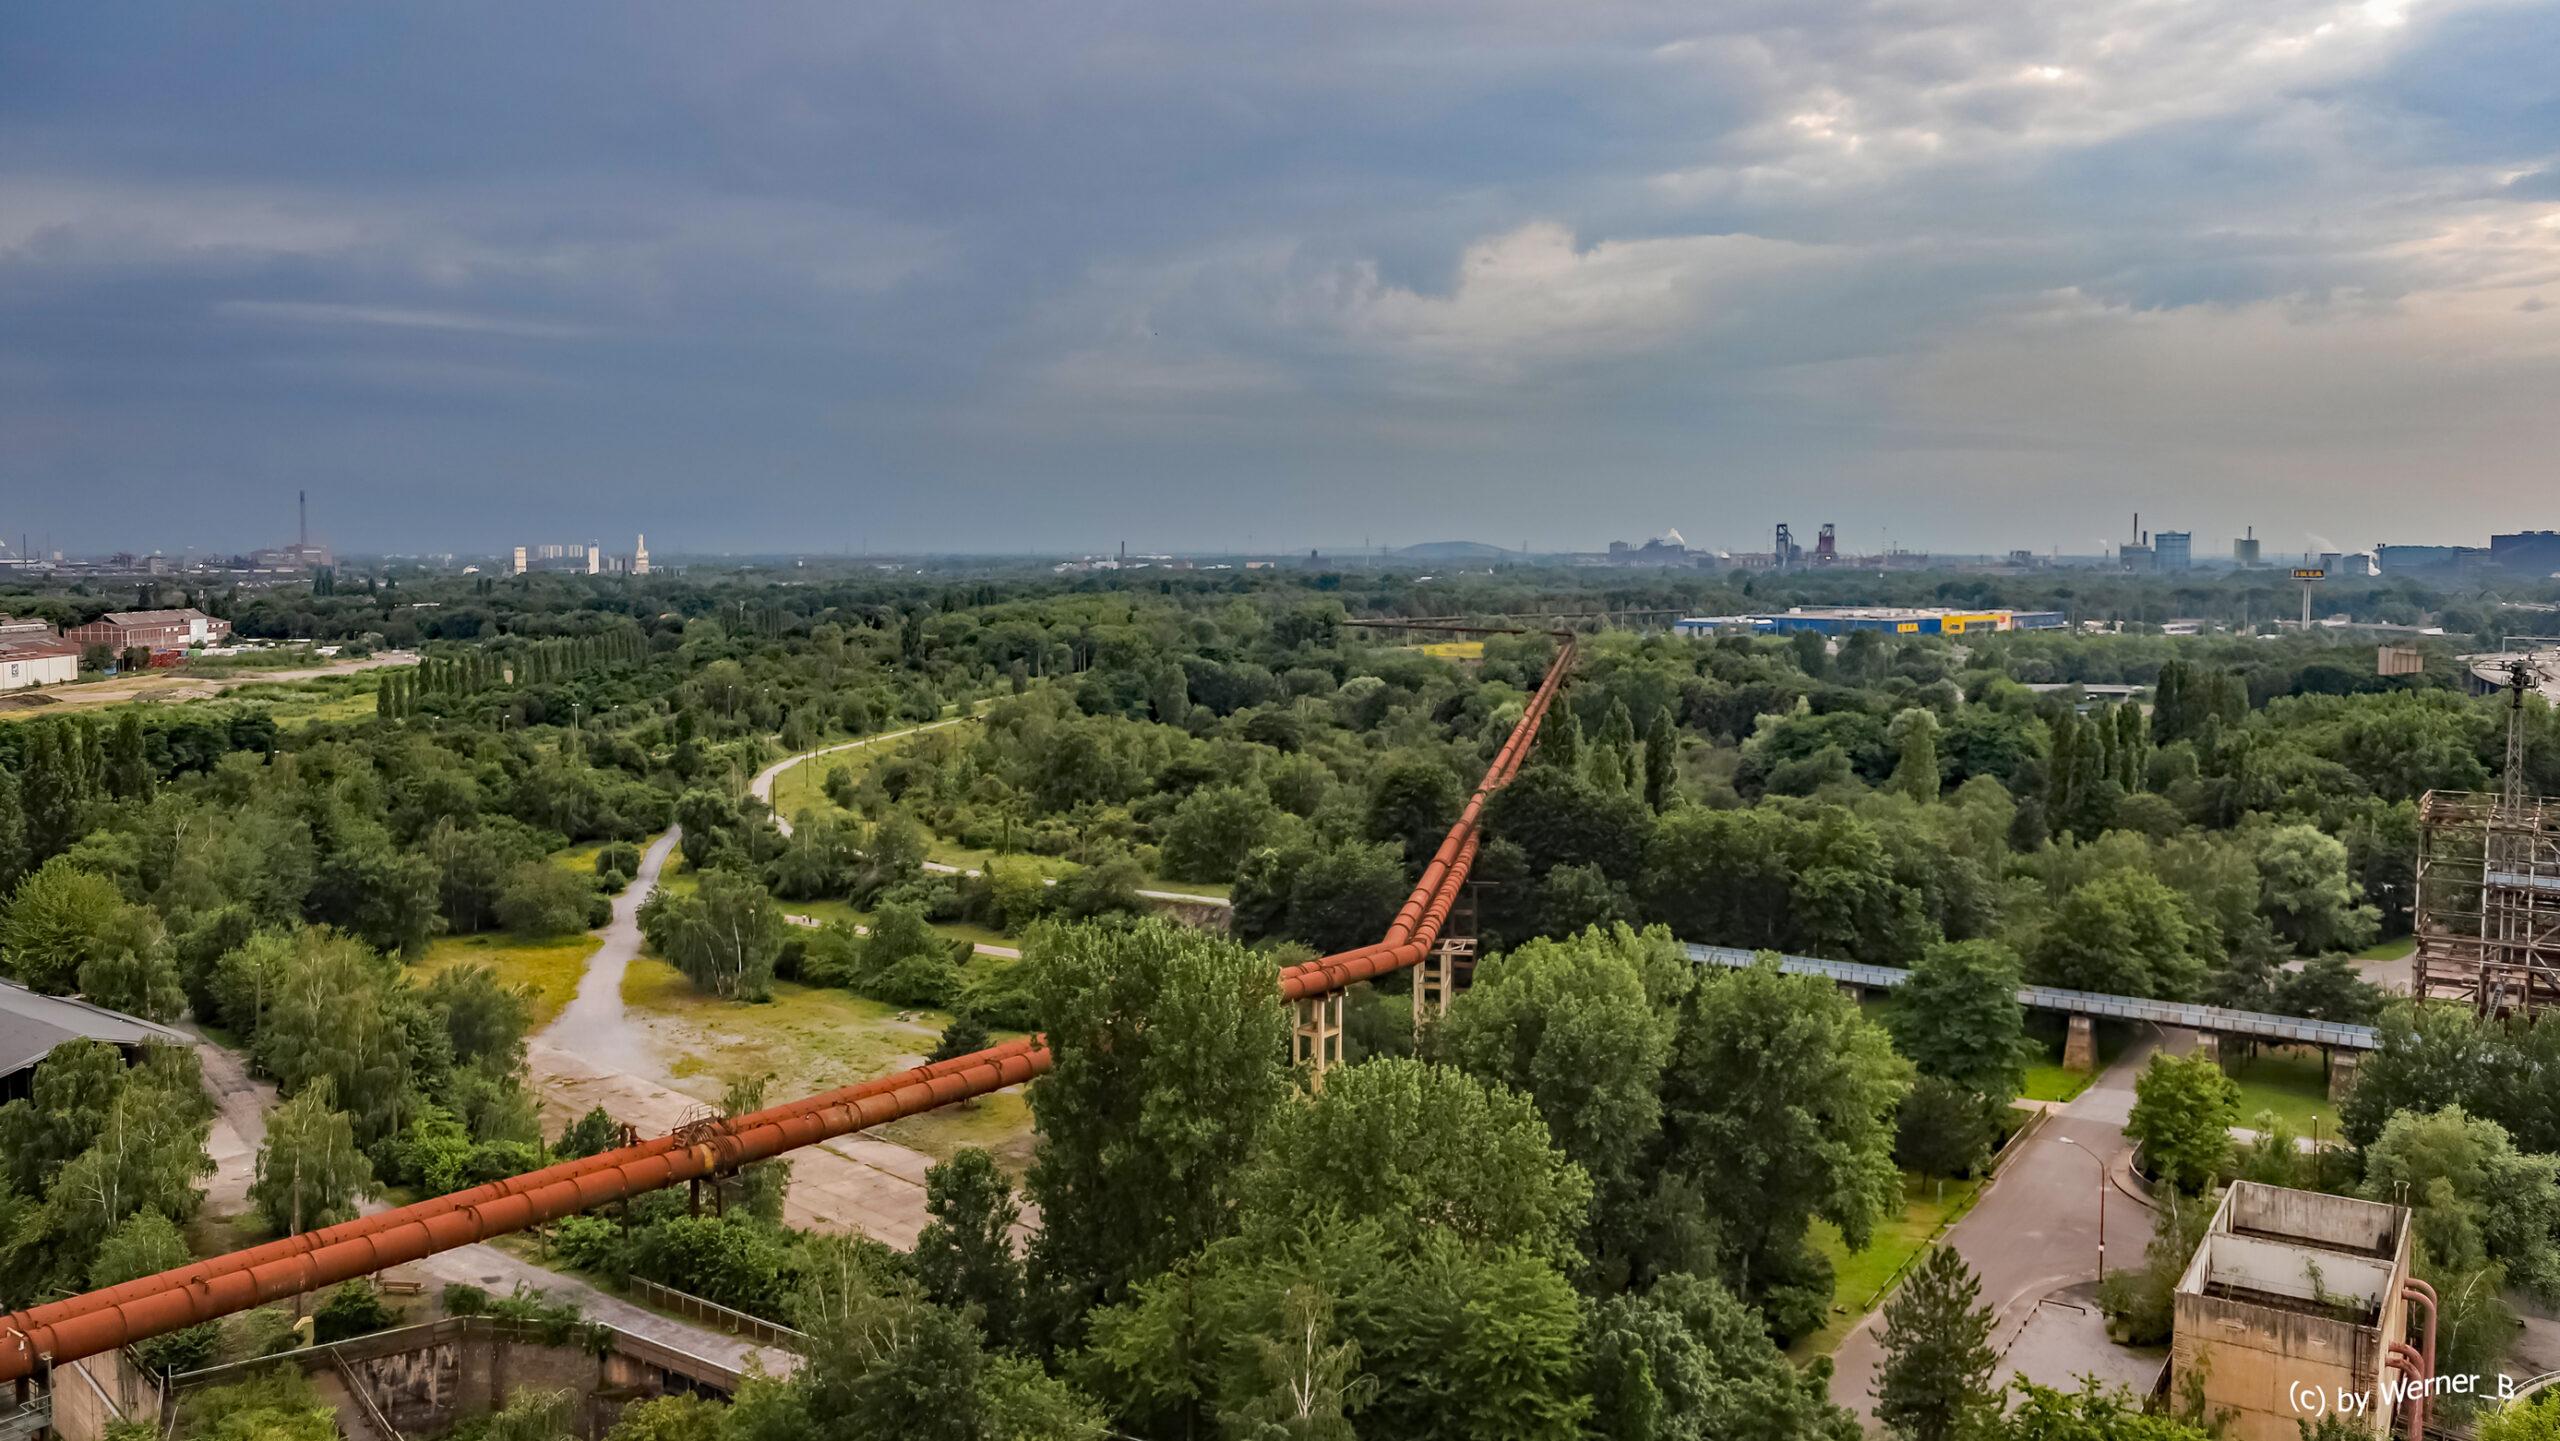 Die Welt: Nord Stream 2 to kolejna kompromitacja Niemiec